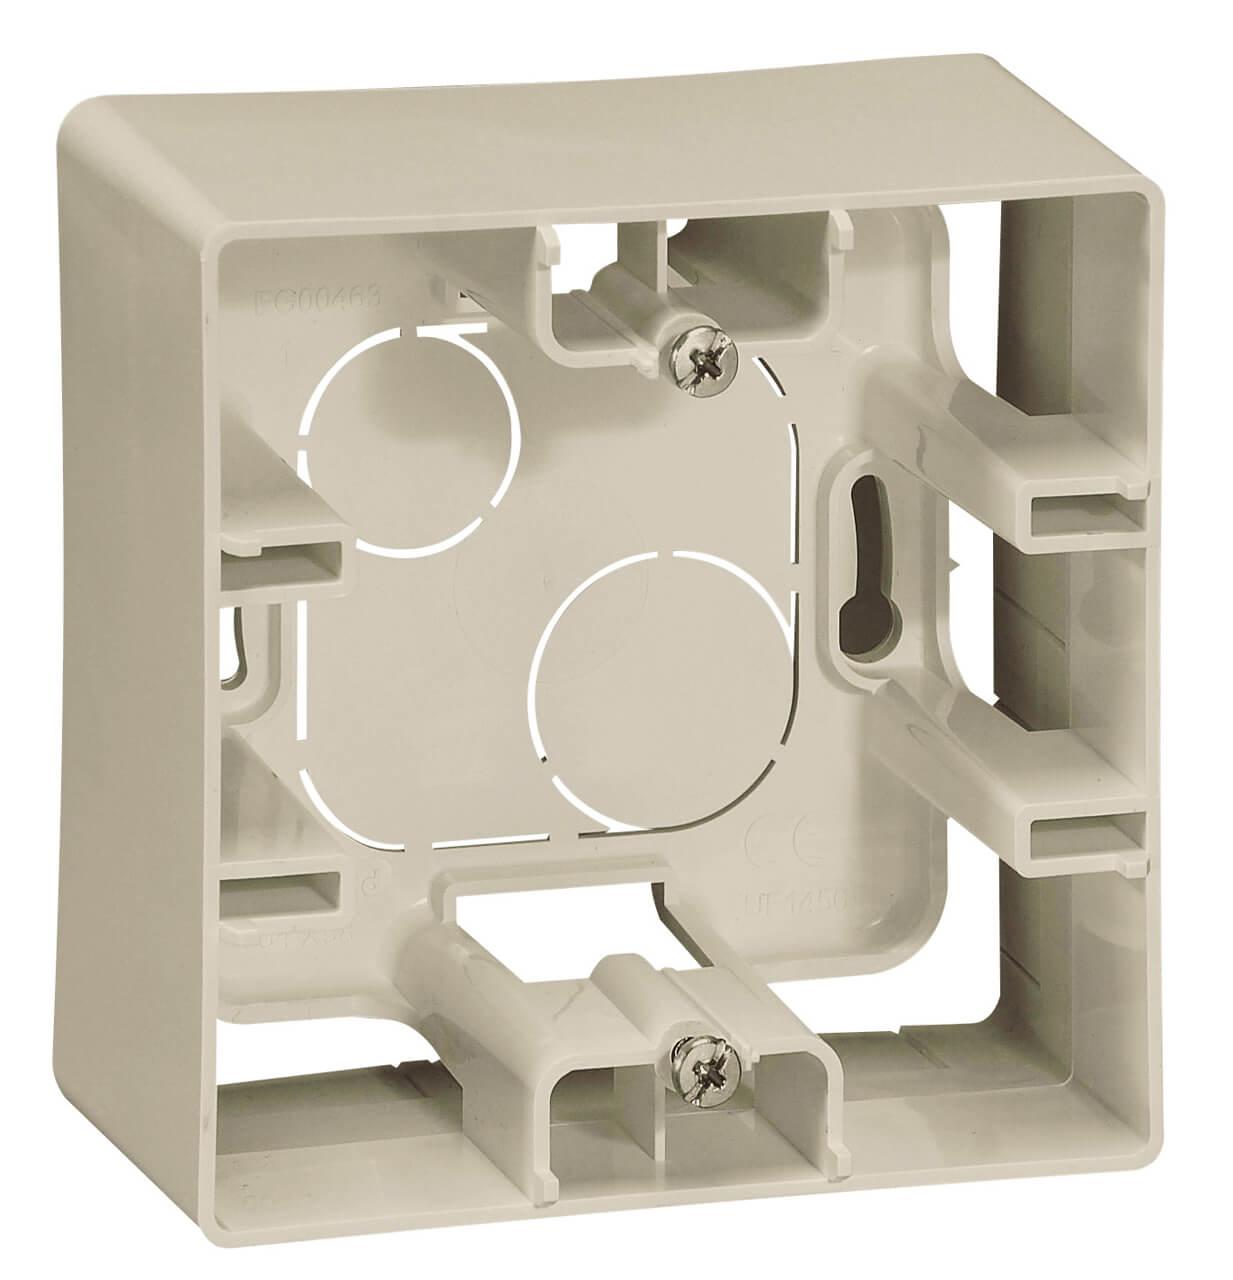 Коробка для накладного монтажа 1-постовая Legrand Etika слоновая кость 672520 бокс для накладного монтажа rexant bn 01 бежевый